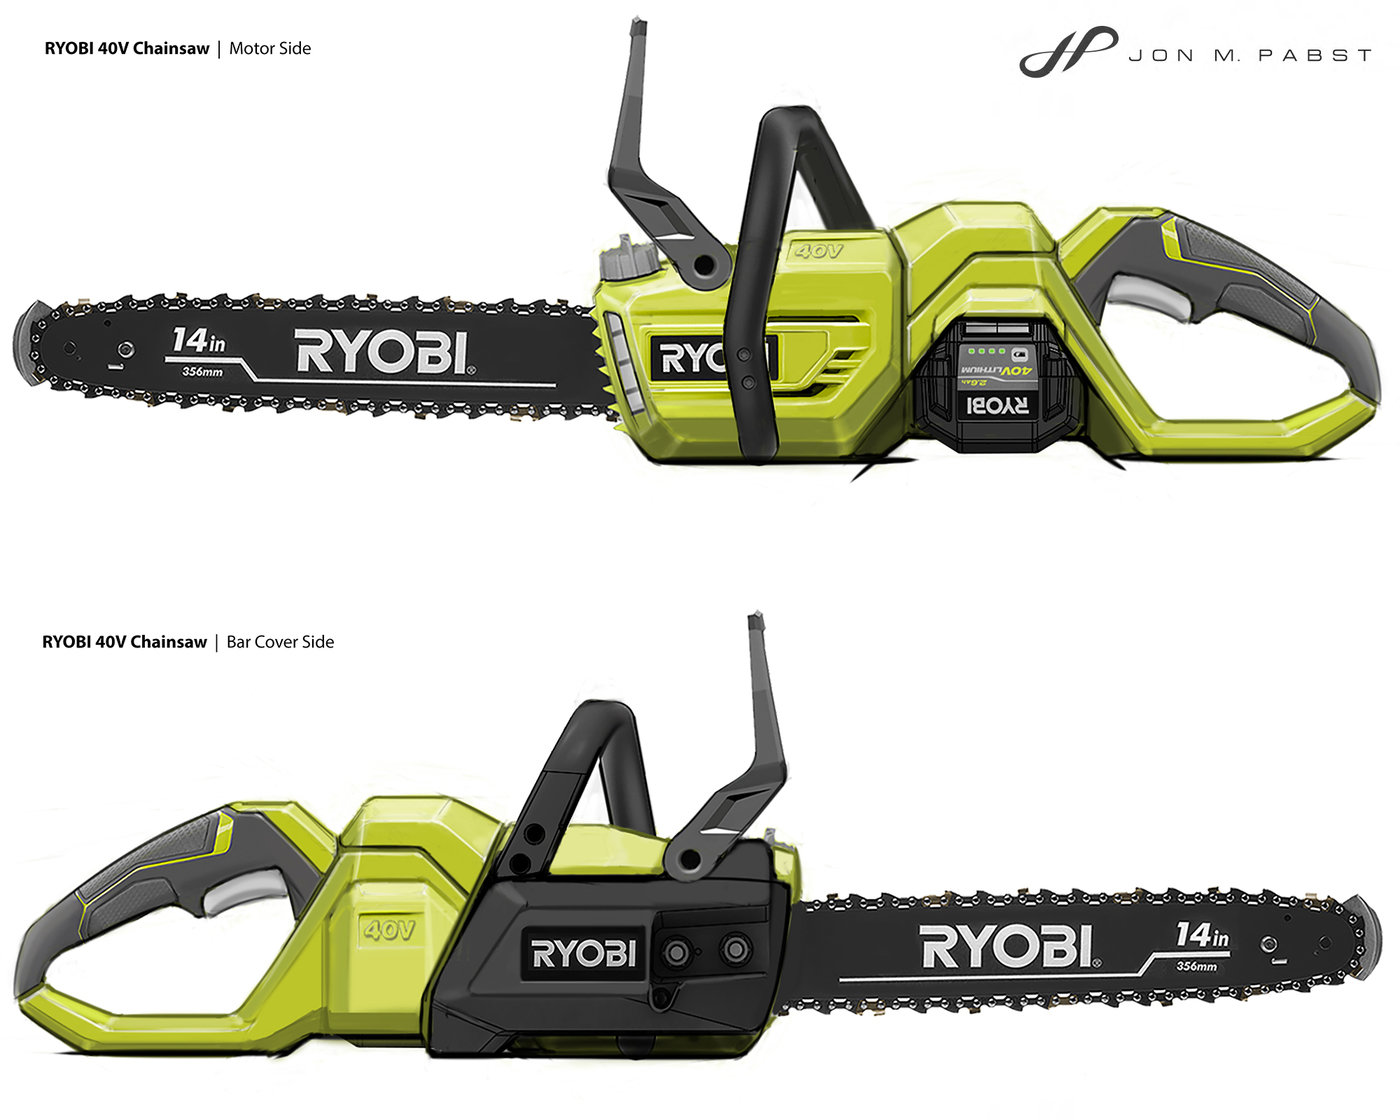 Ryobi 40v Cordless Chainsaw By Jon Pabst At Coroflot Com